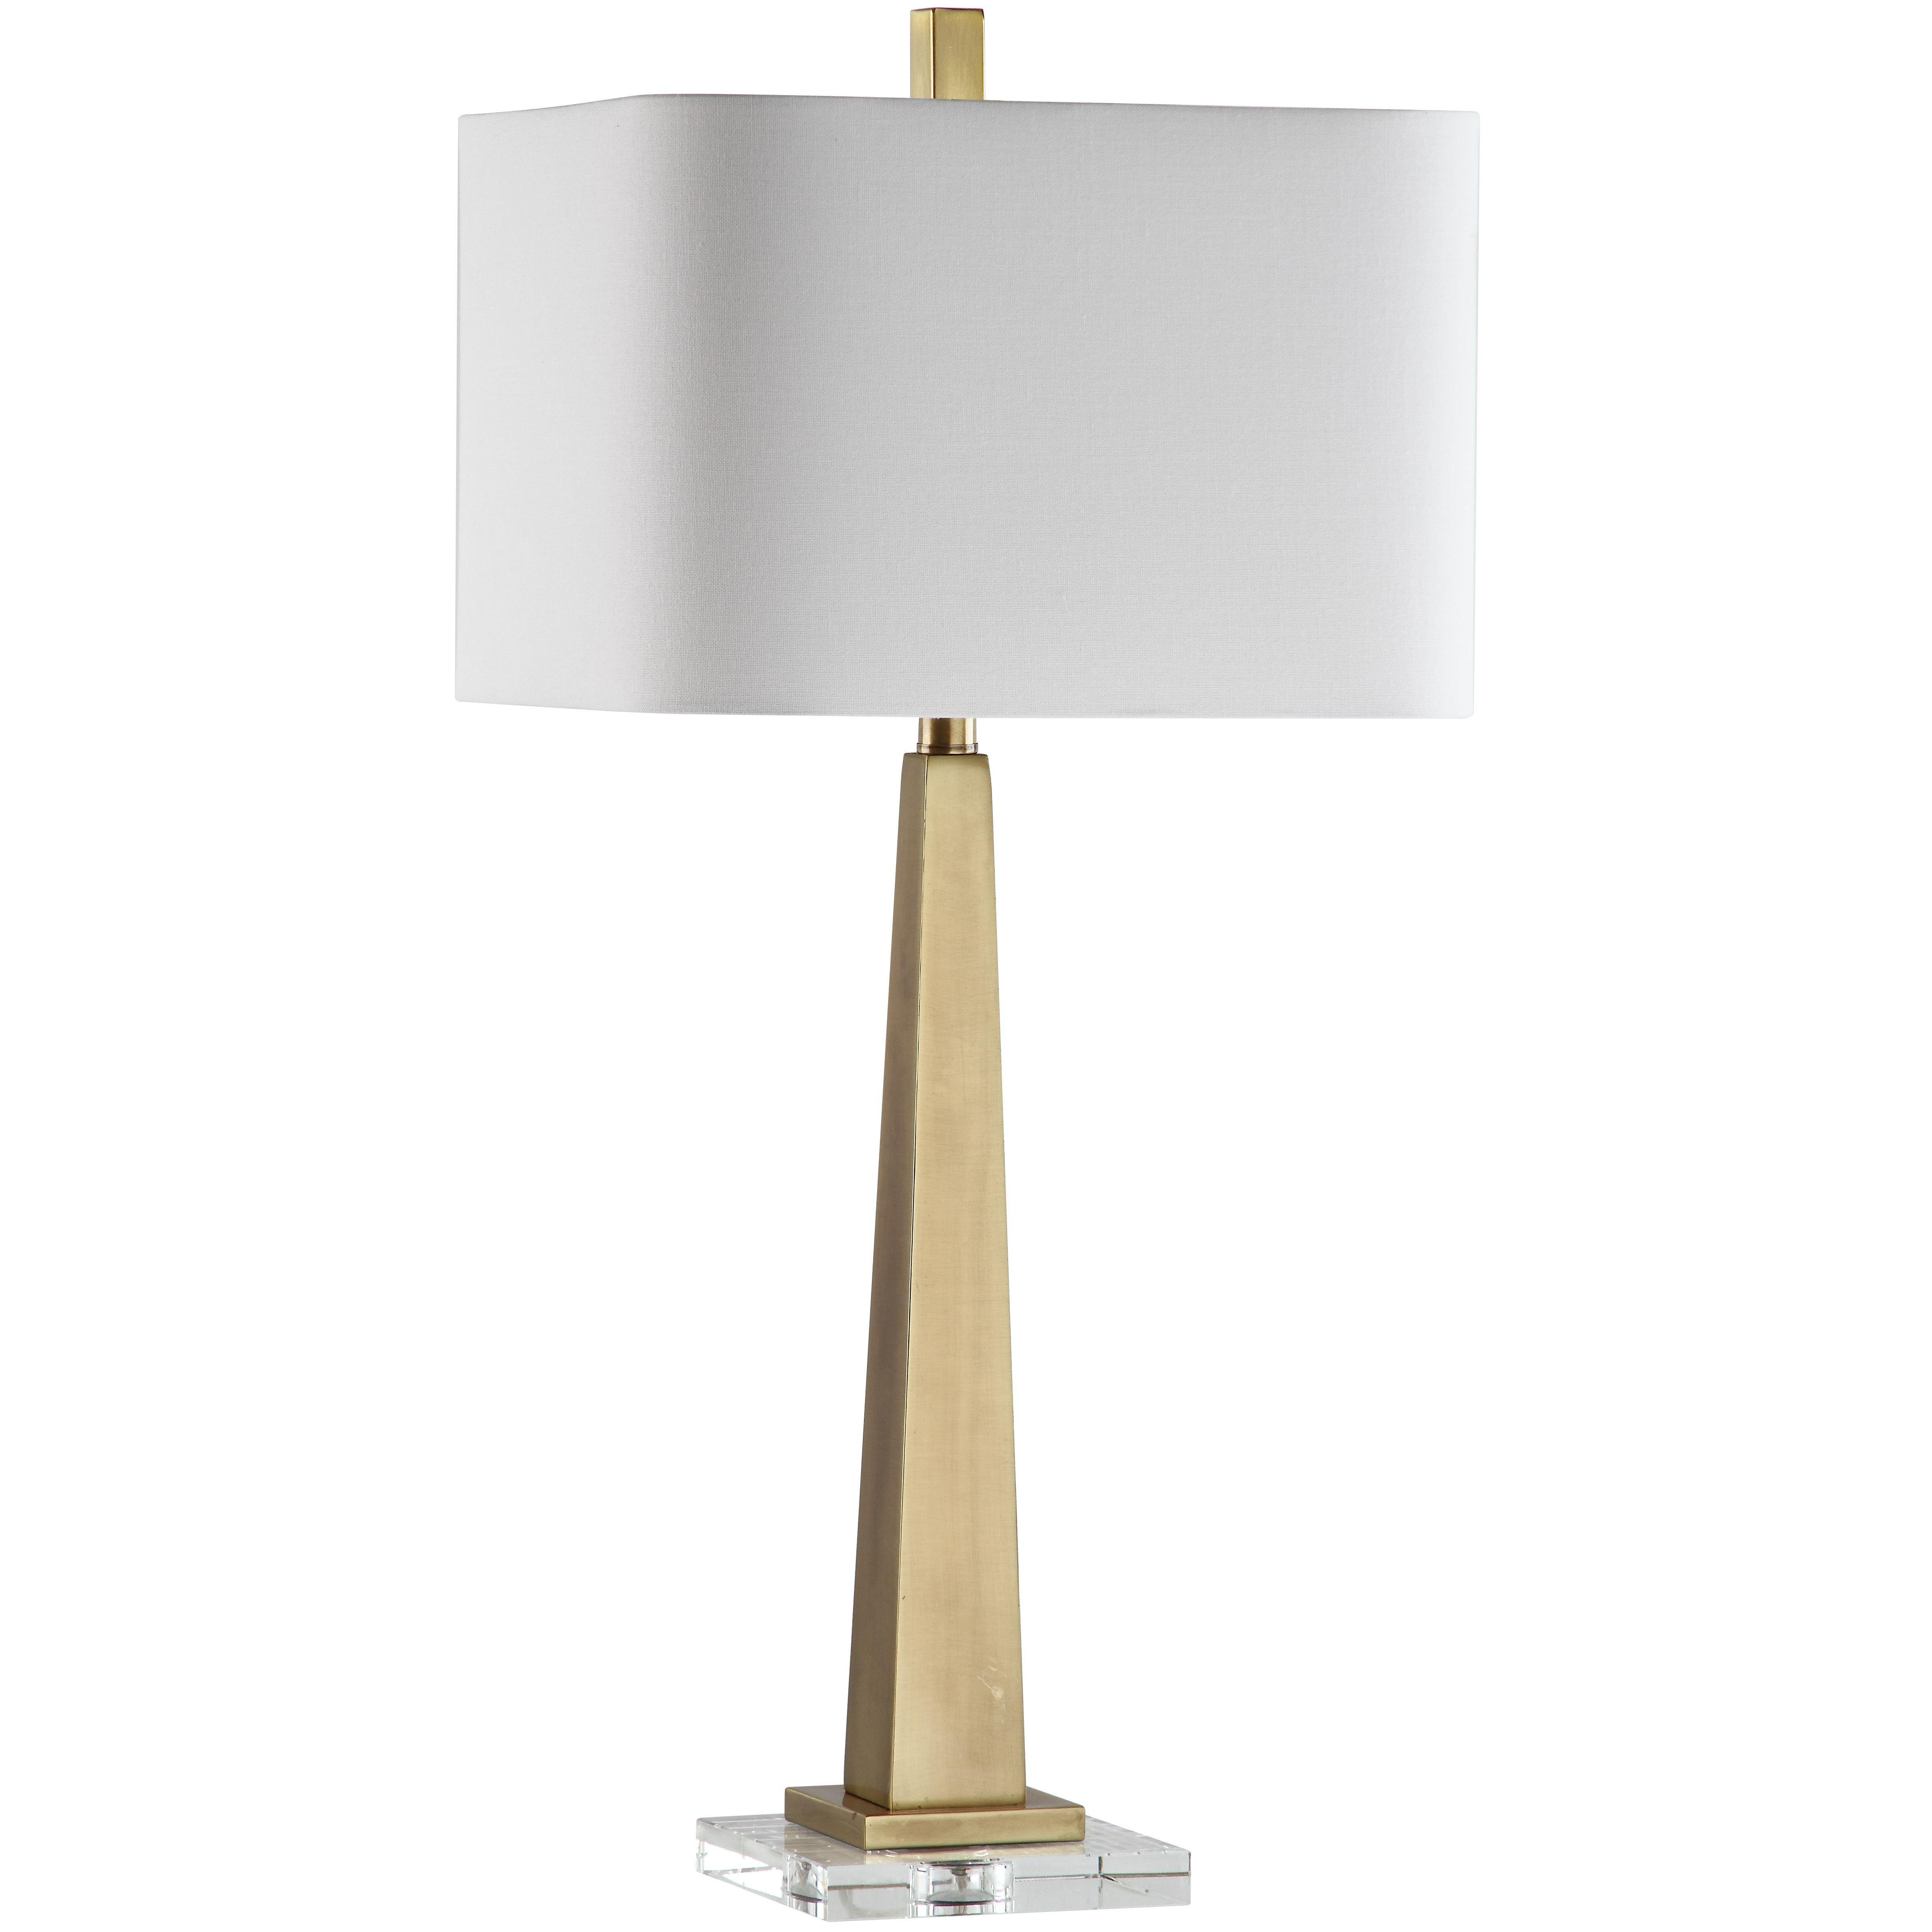 32 Table Lamp Table Lamp Brass Table Lamps Lamp